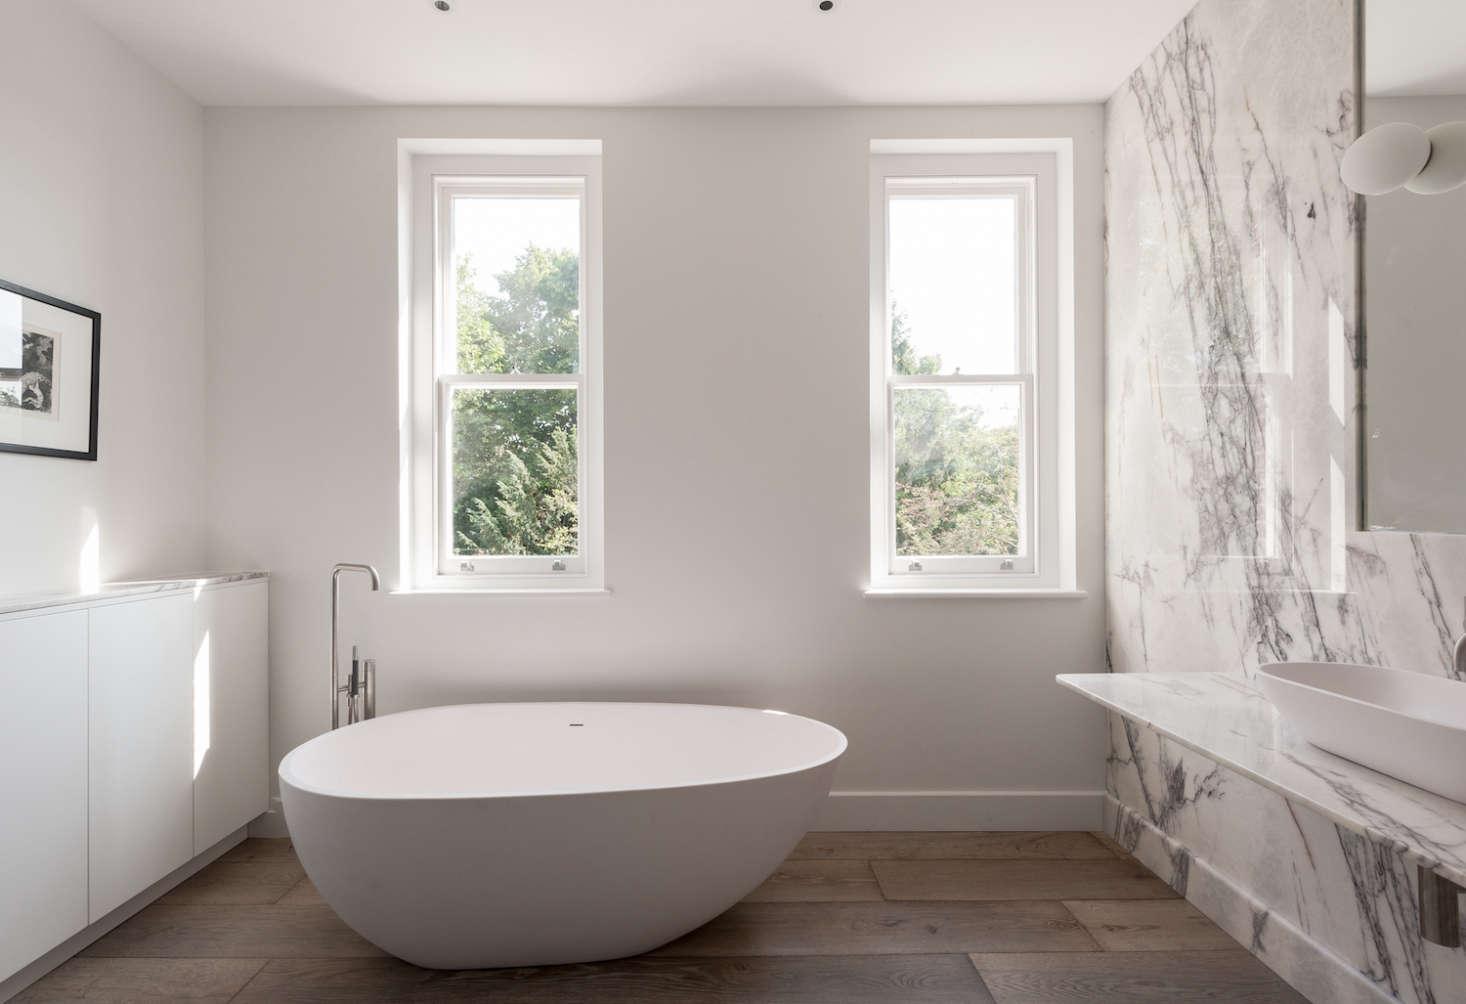 Remodeling 101: Romance in the Bath: Built-In vs. Freestanding ...